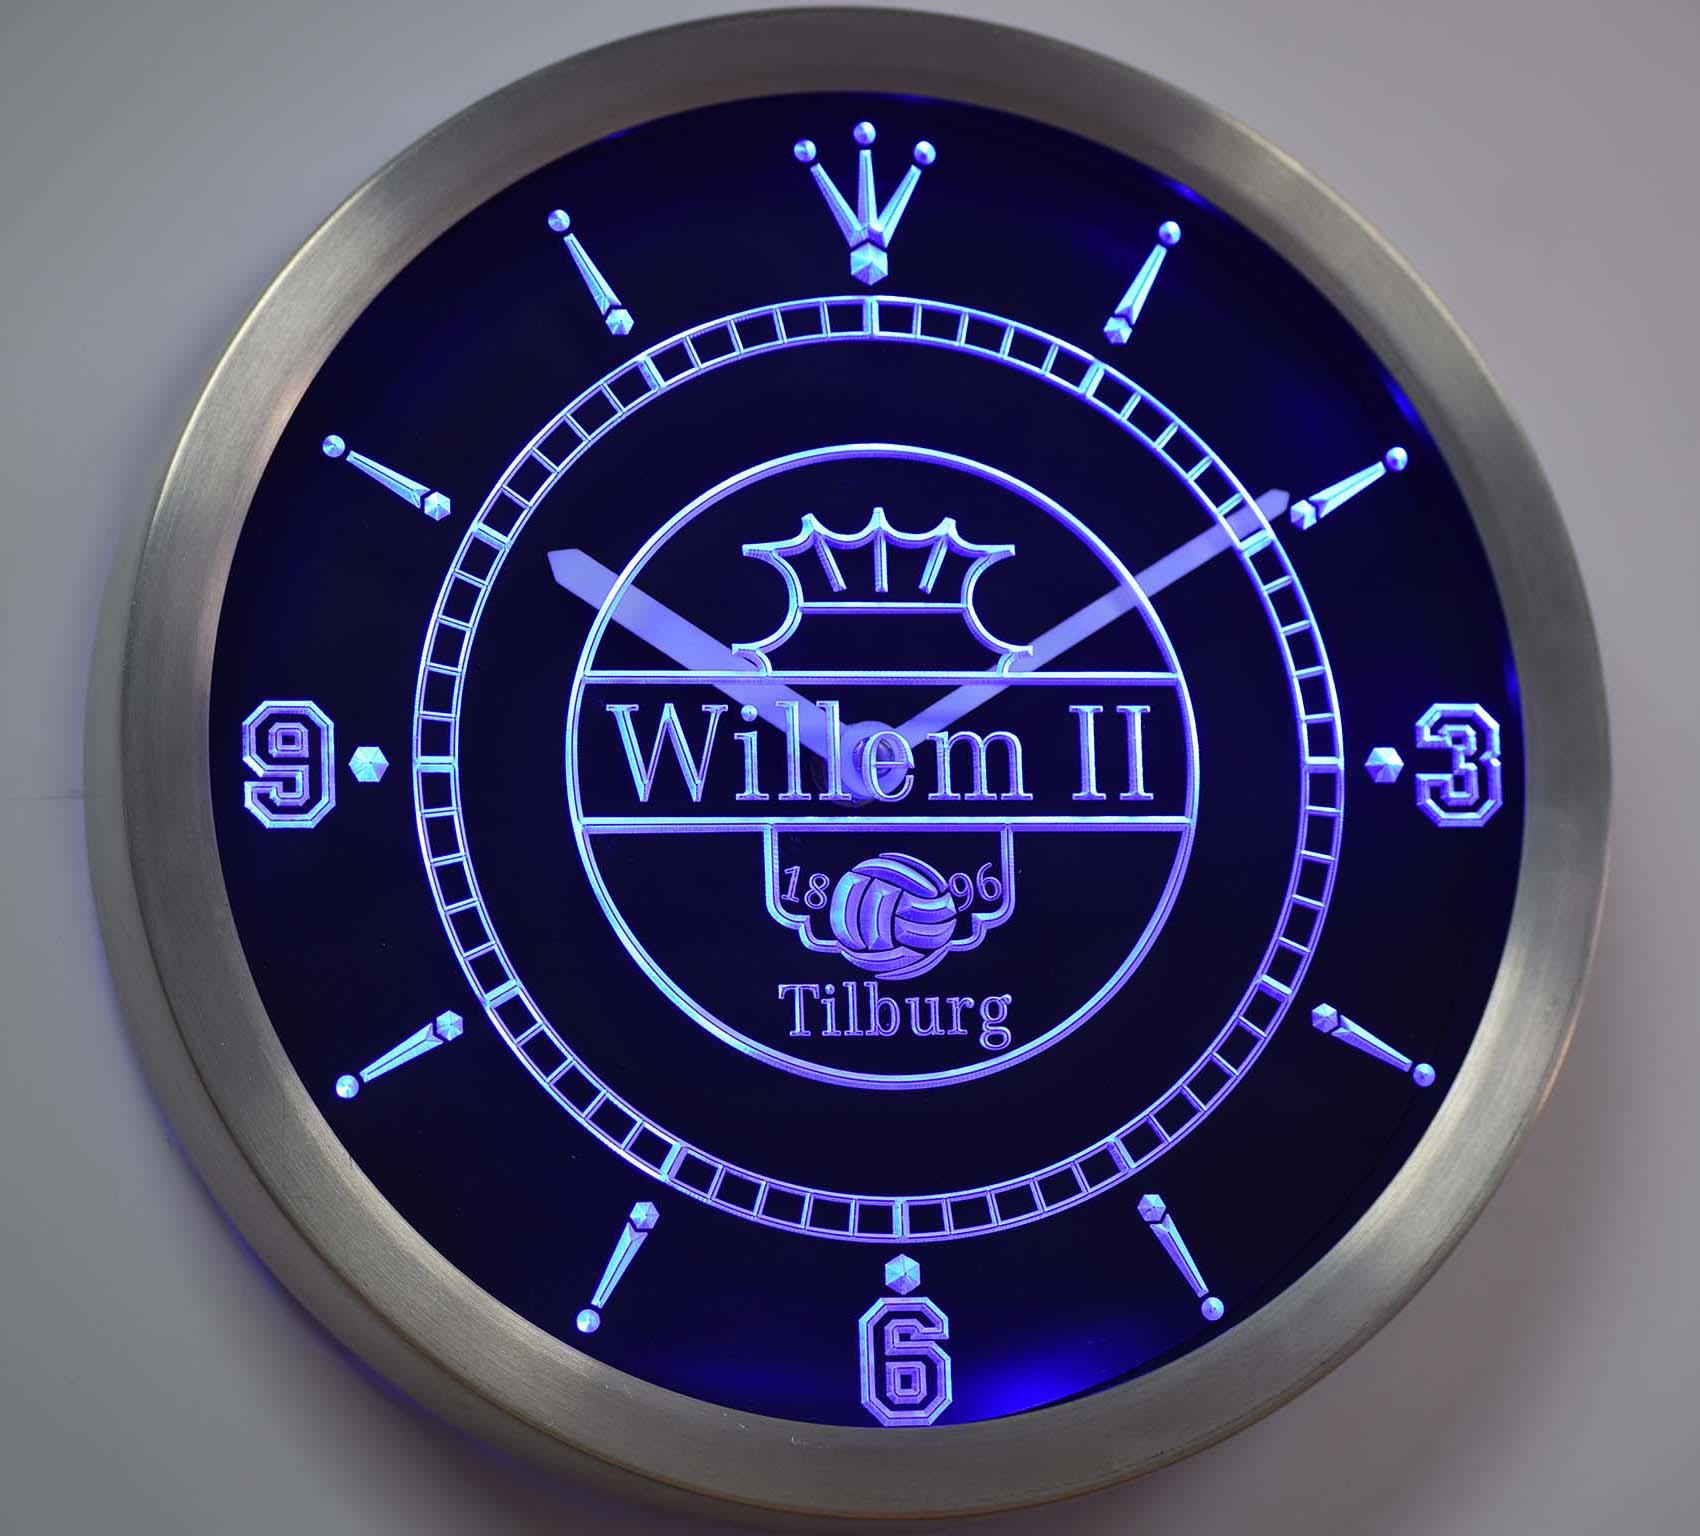 Nc1021 Willem II Tilburg Eredivisie, Fútbol letreros de neón Reloj de pared led